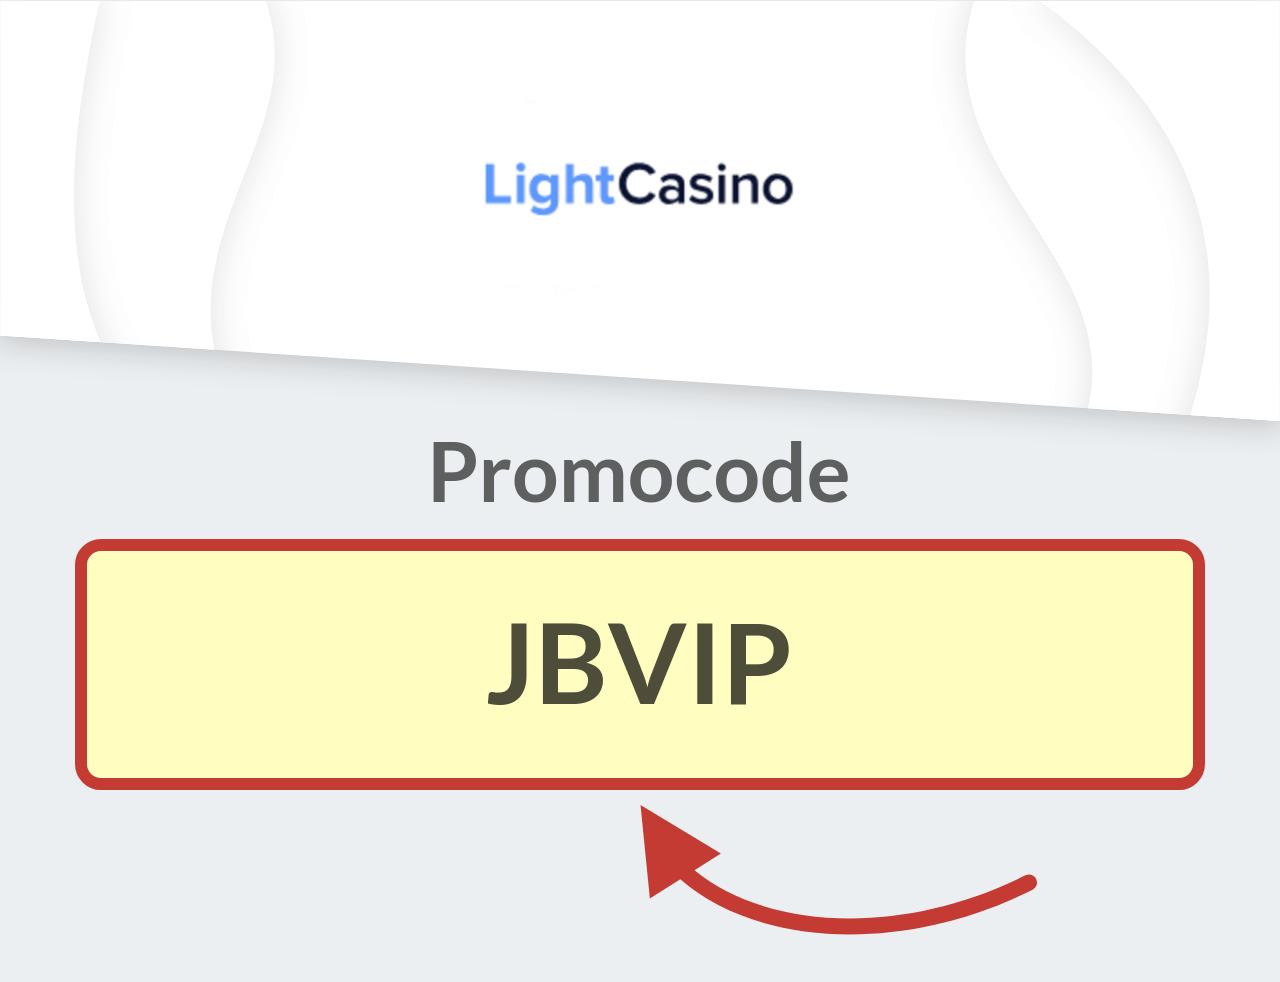 LightCasino Promo Code